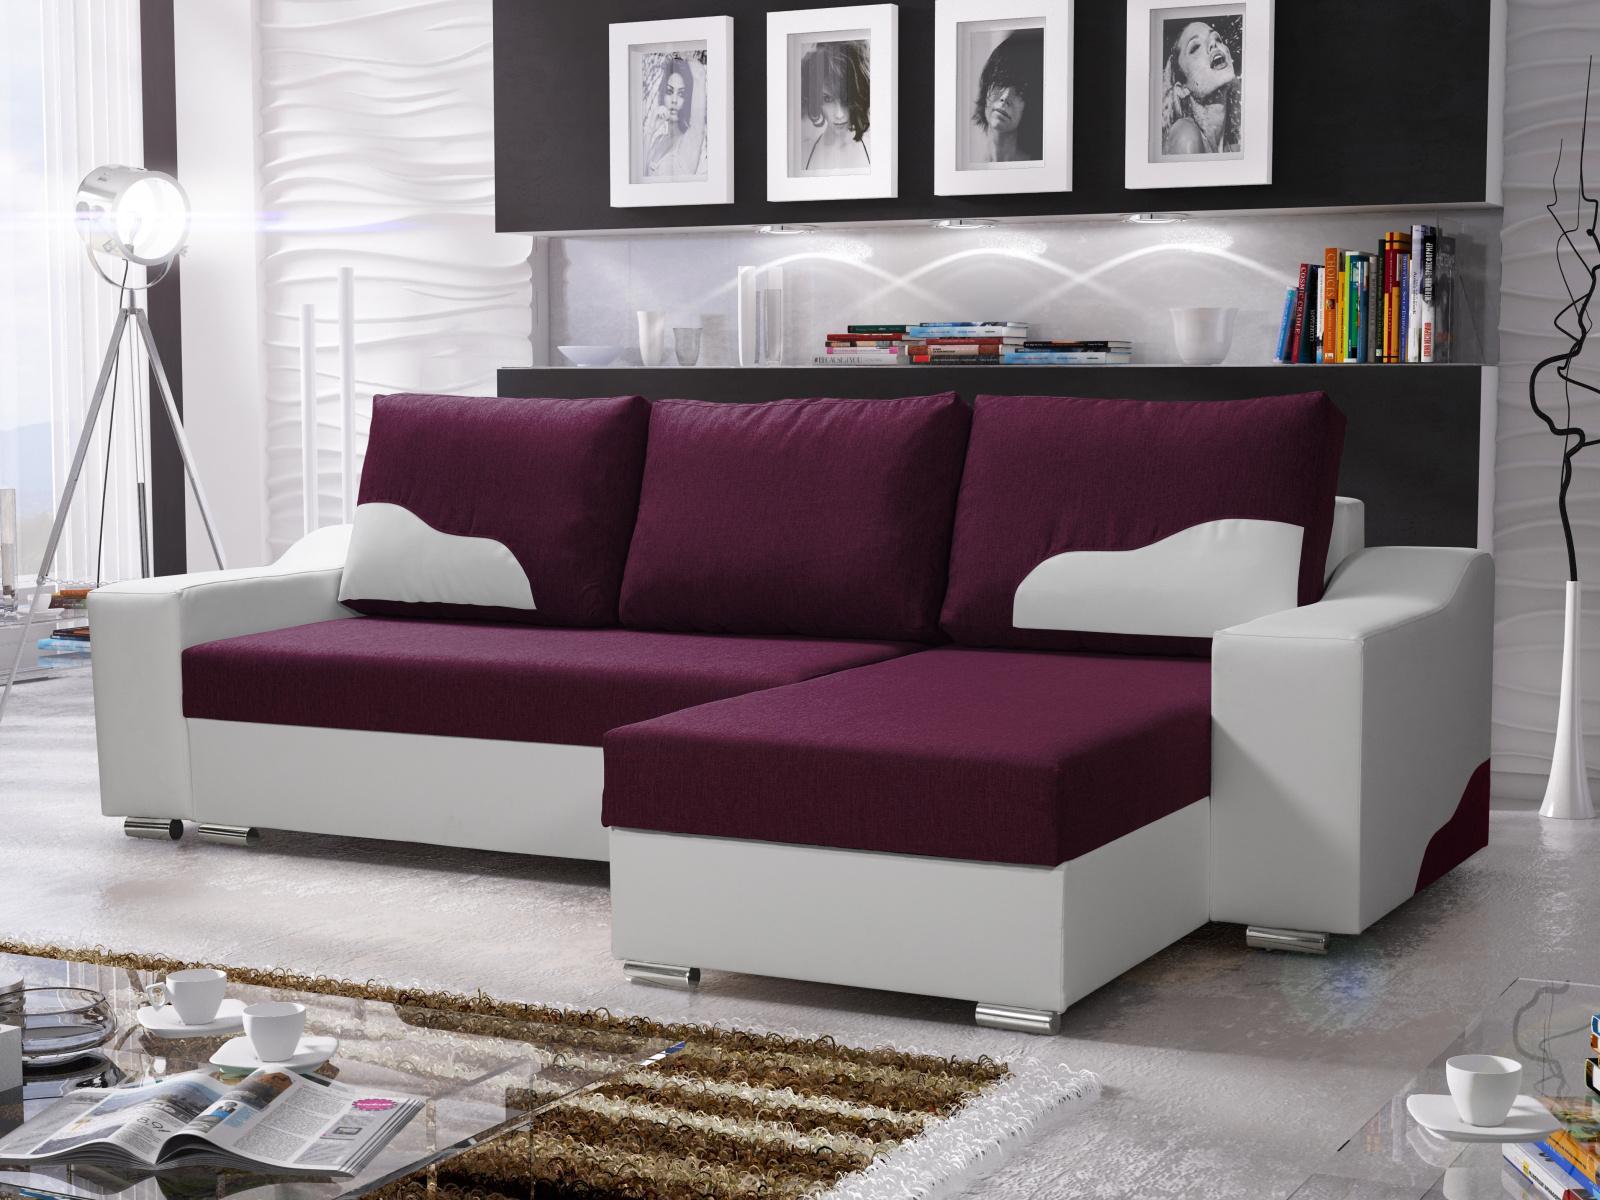 Smartshop Rohová sedačka WILLIAM 270/6, fialová látka/bílá ekokůže